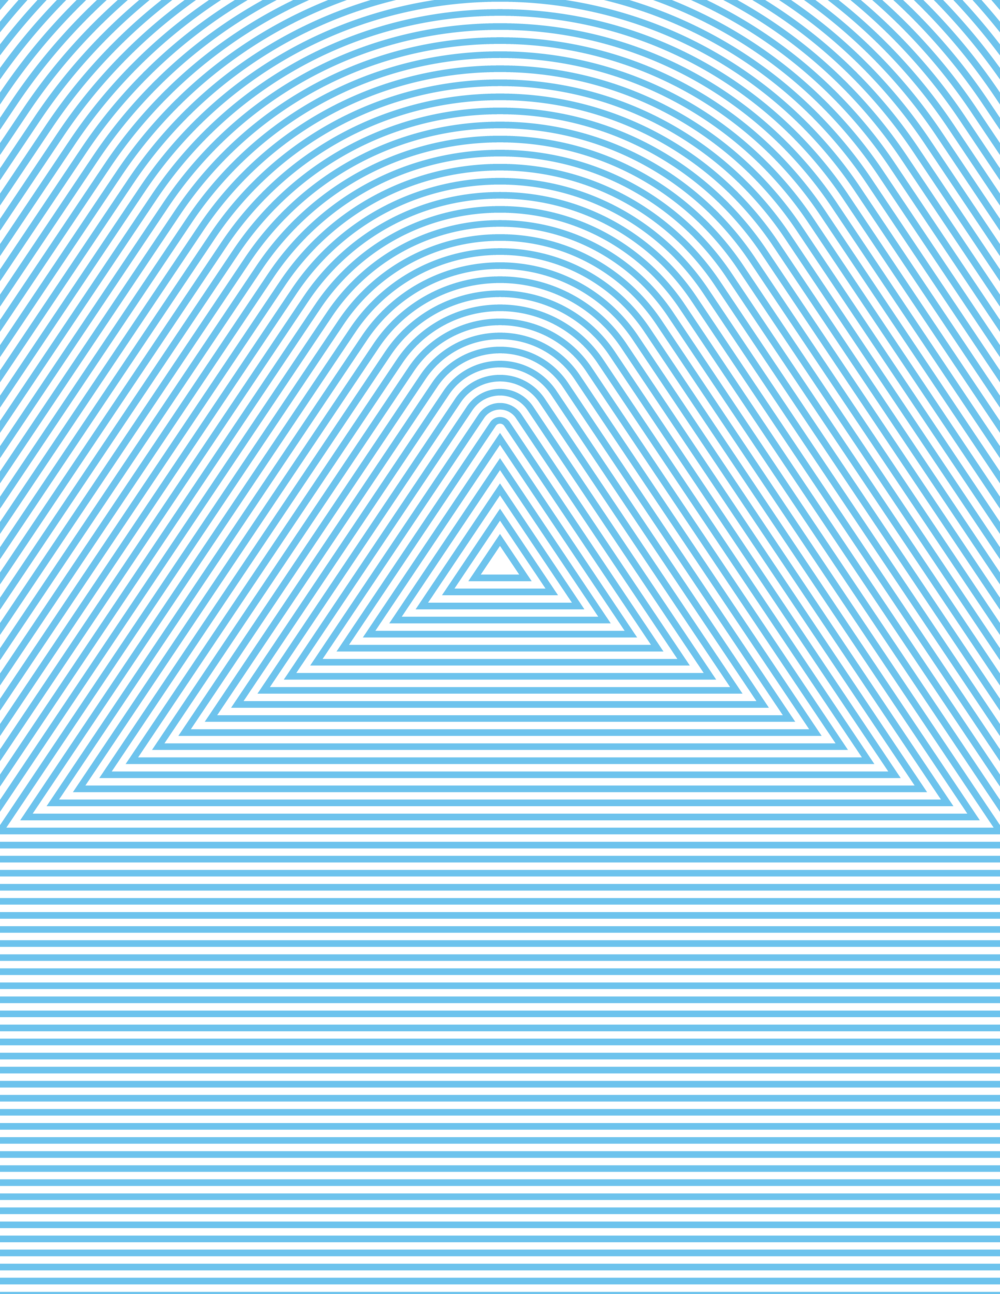 H_Pattern 1-01.png